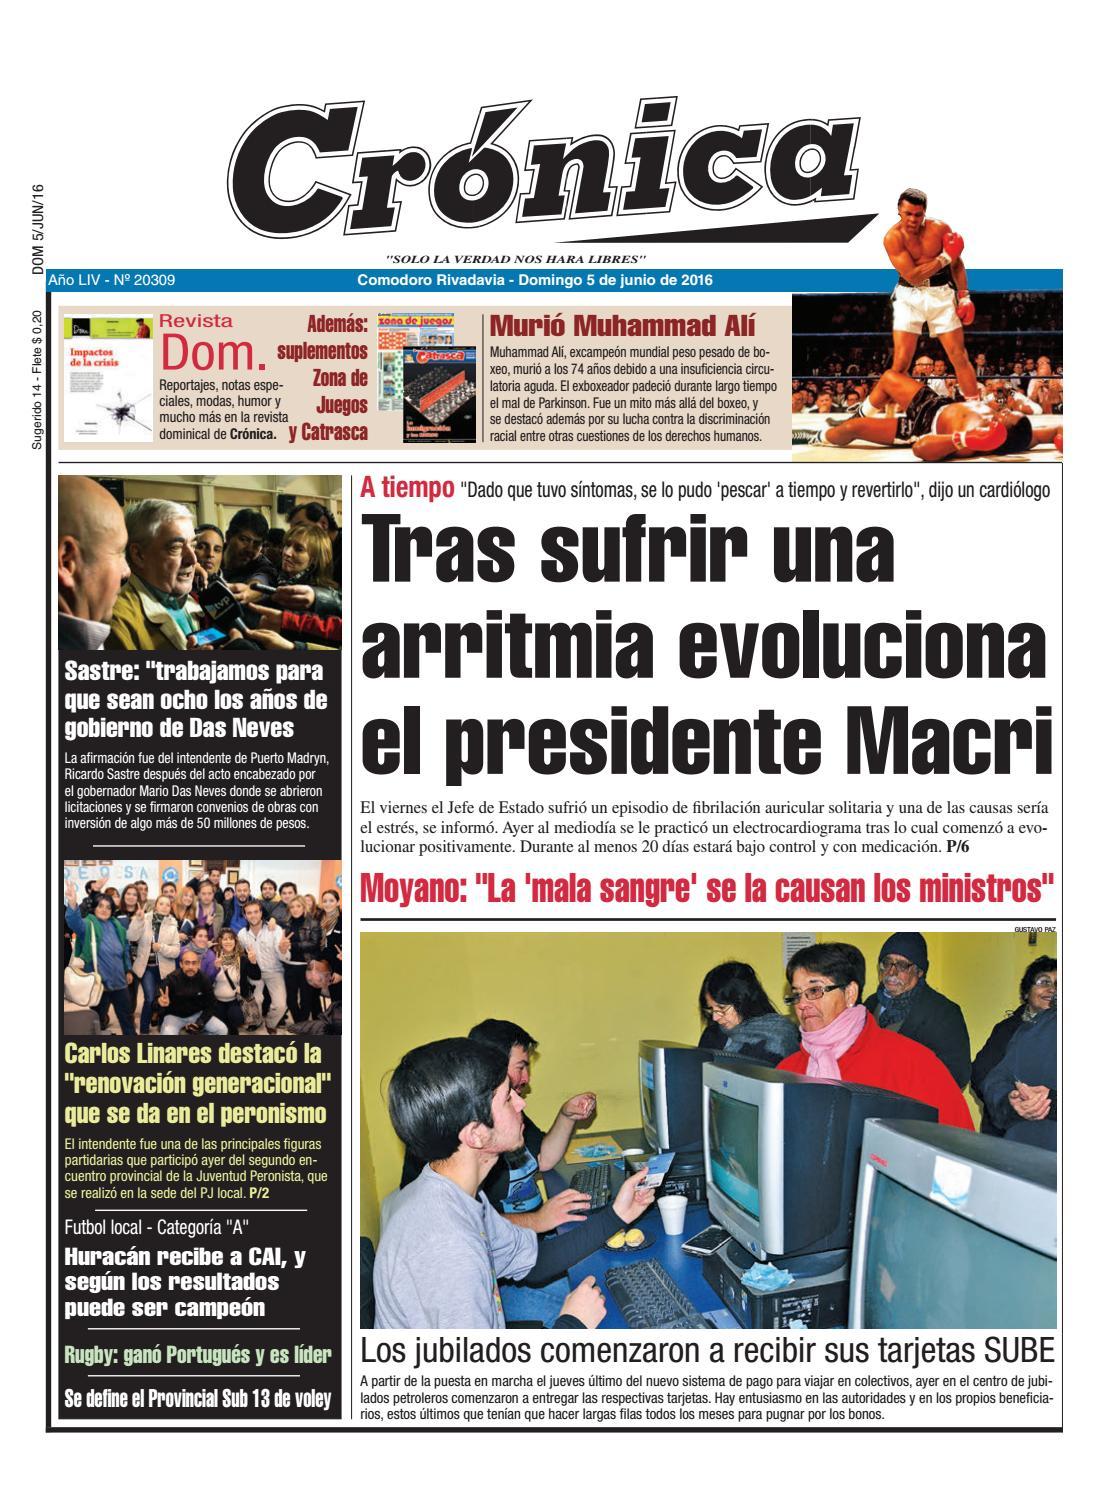 2f9d3a324bc20f4015dc68e9d0bb708b by Diario Crónica - issuu